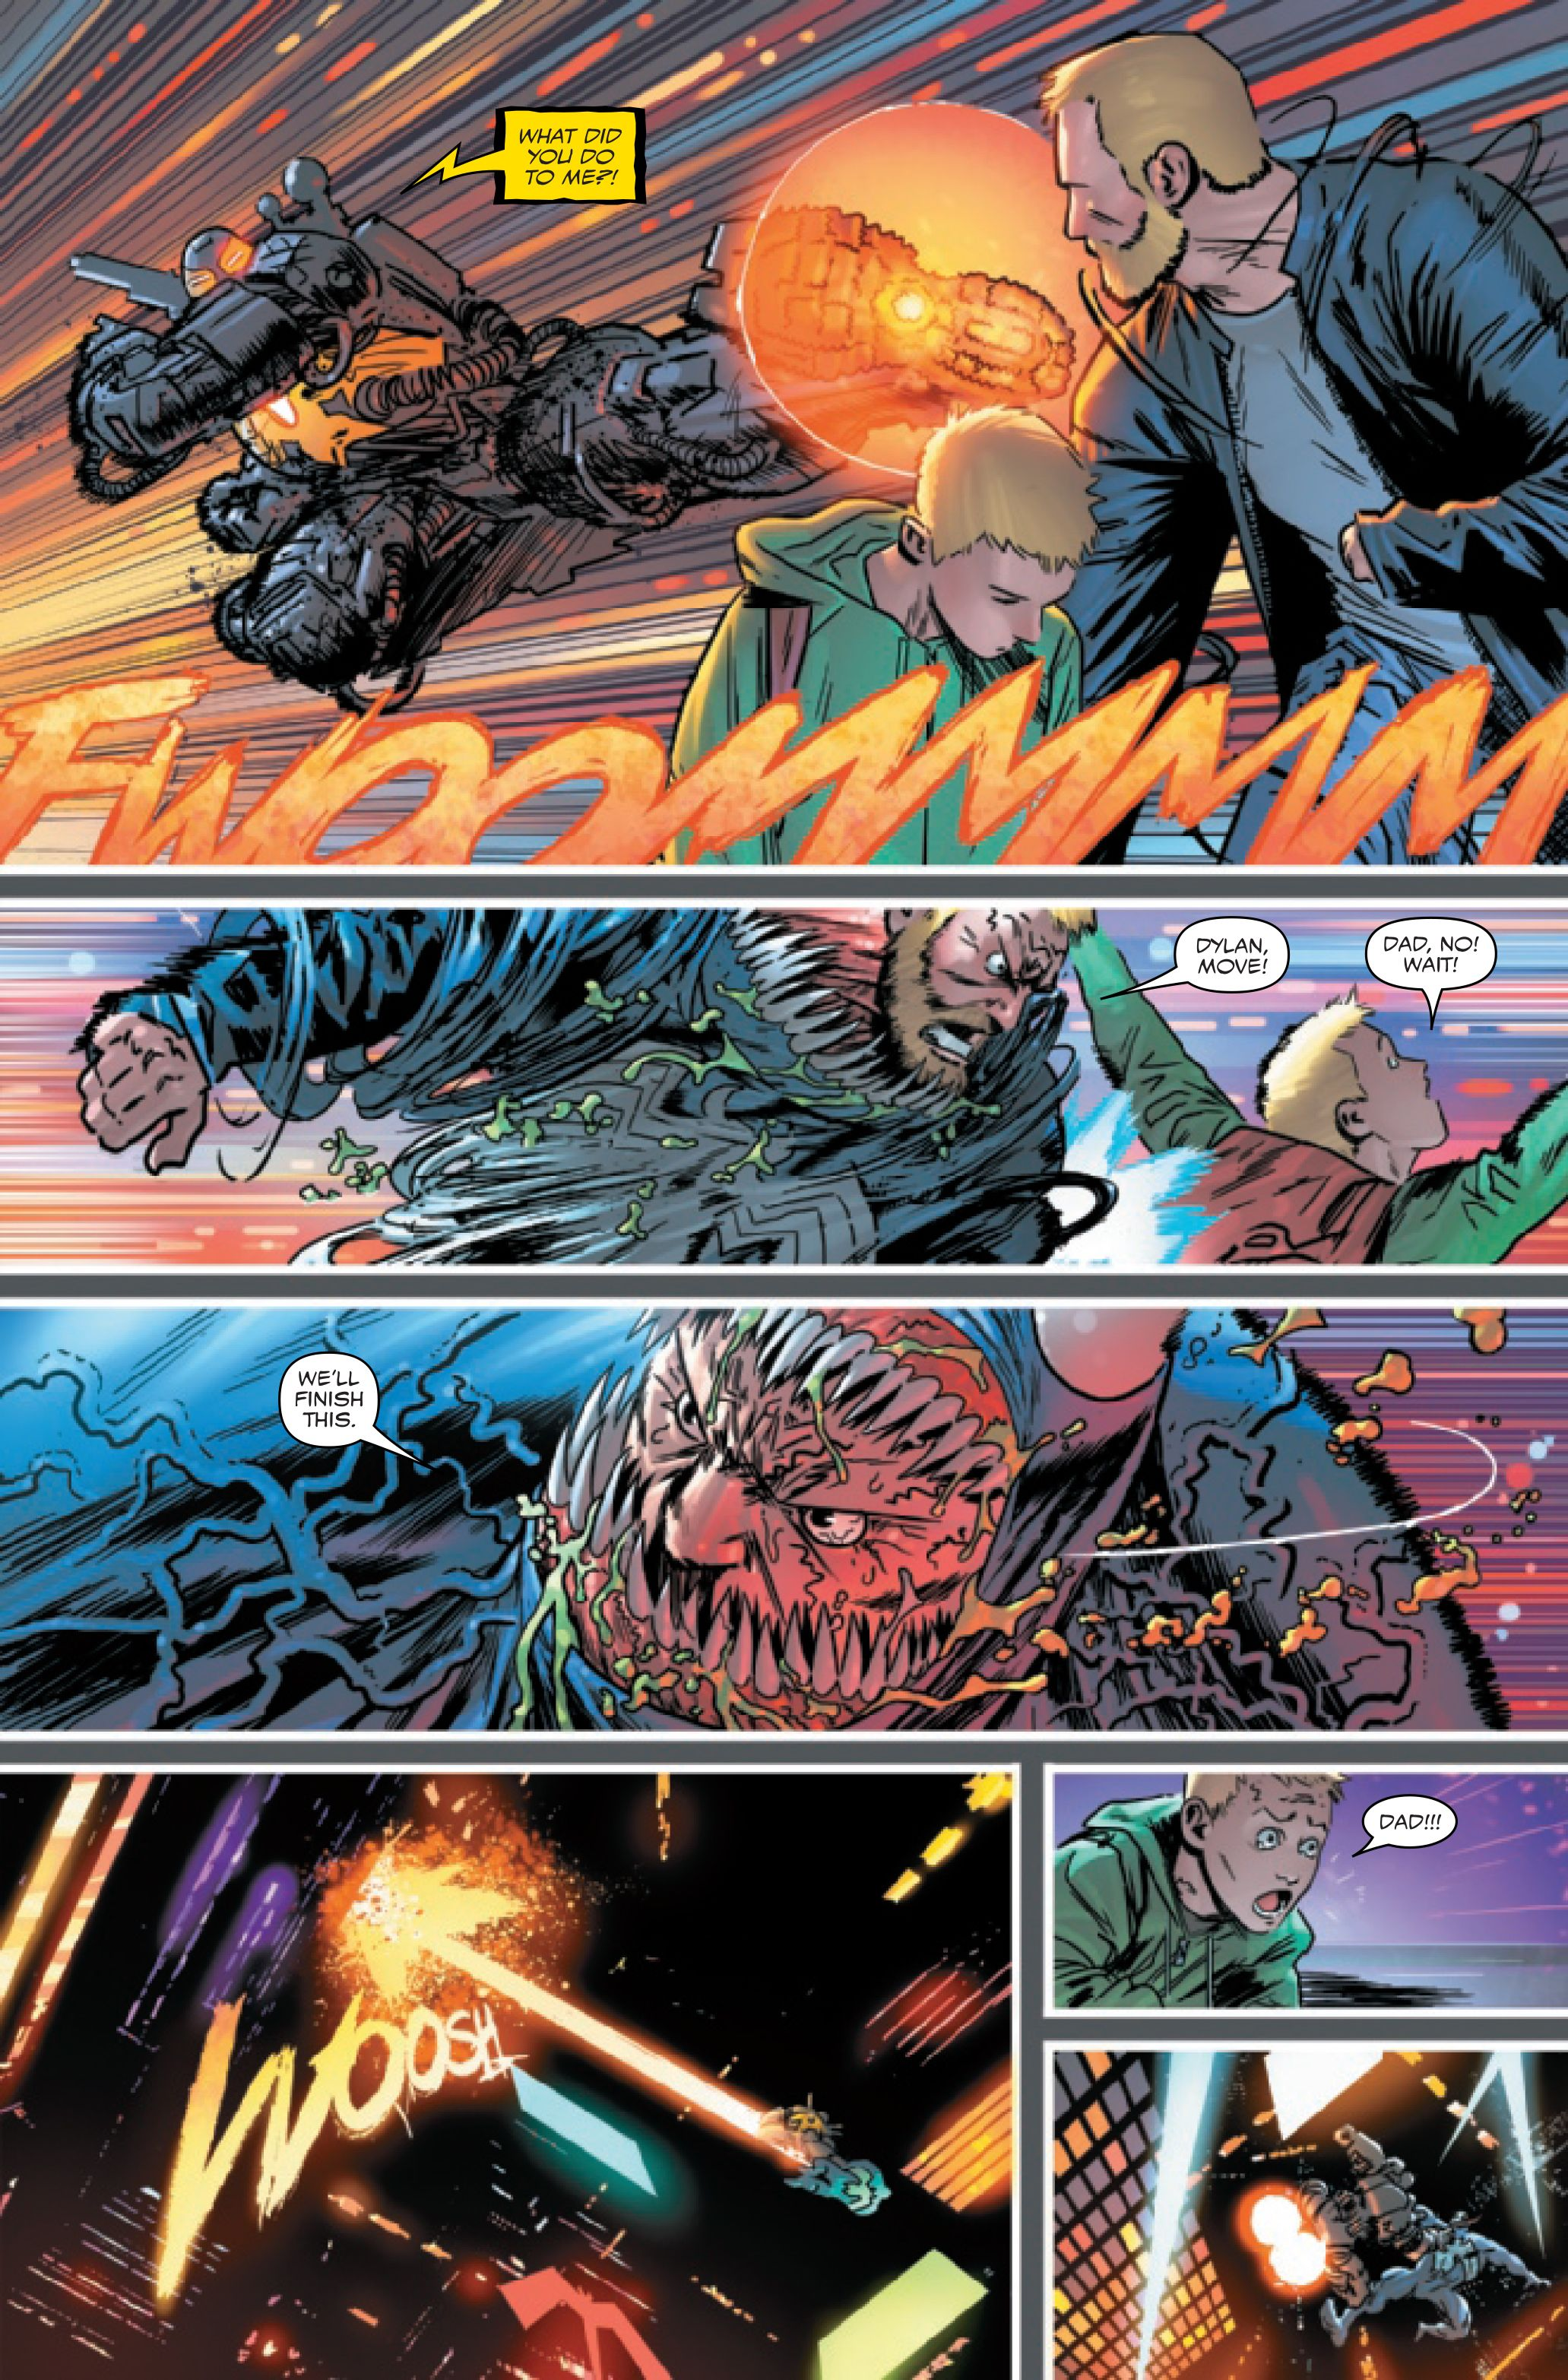 Venom: Simbiote alienígena de Eddie Brock [SPOILER] e Ed pela primeira vez 5